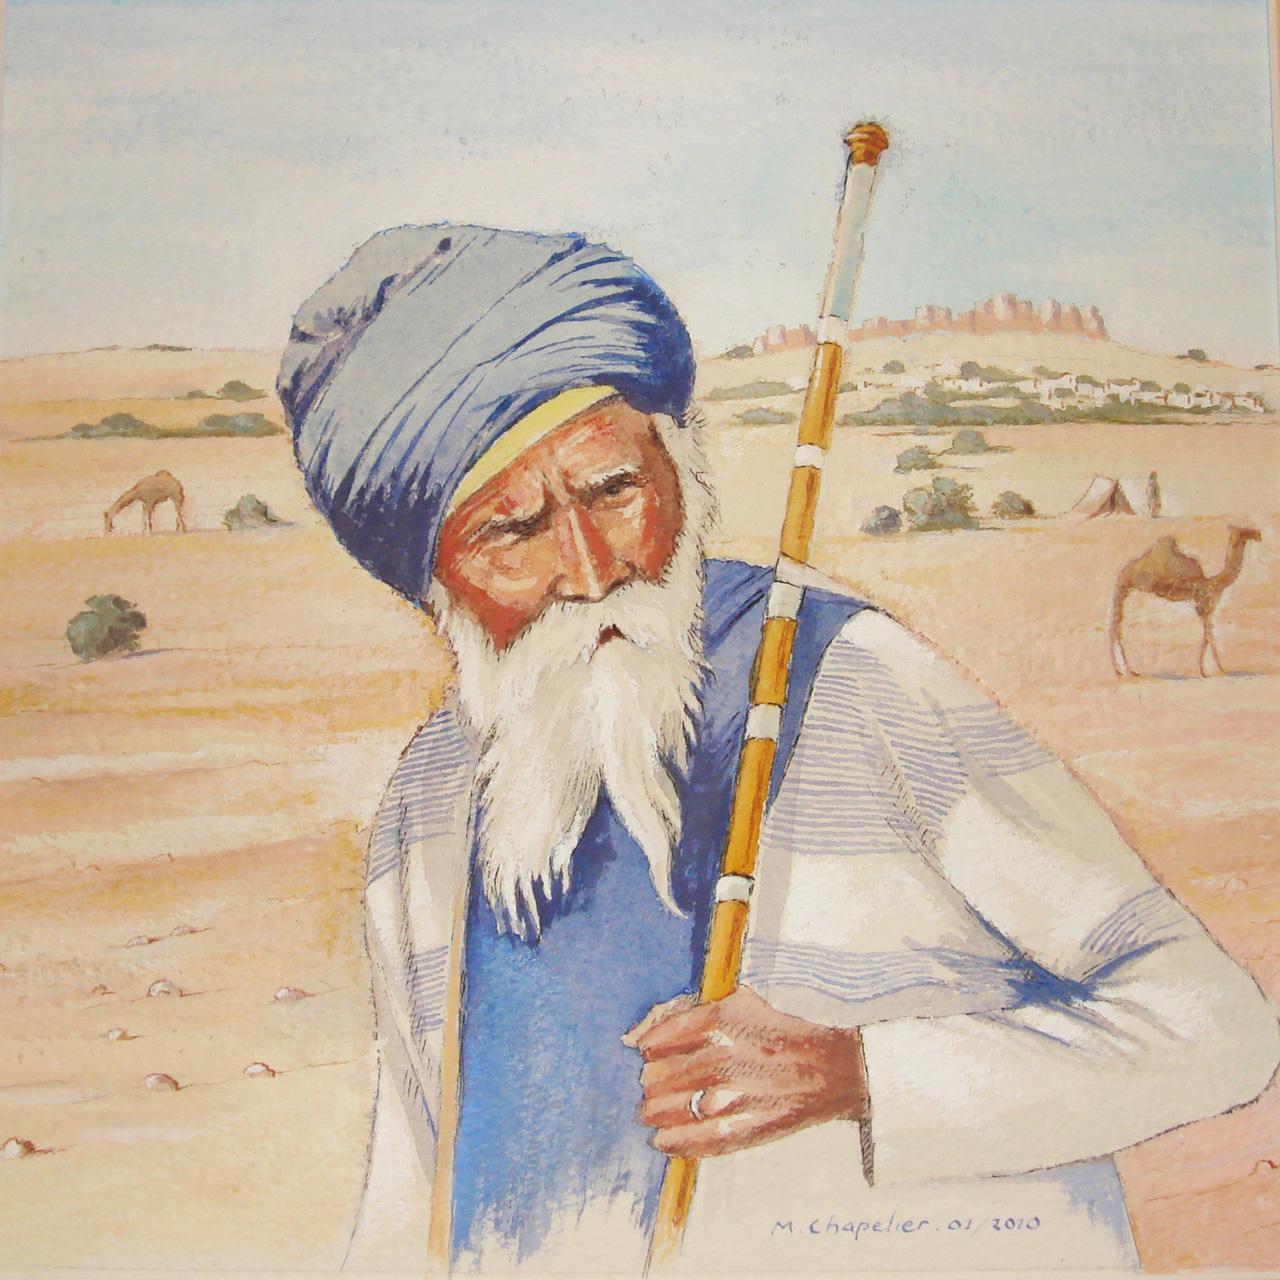 Pelerin du Rajasthan